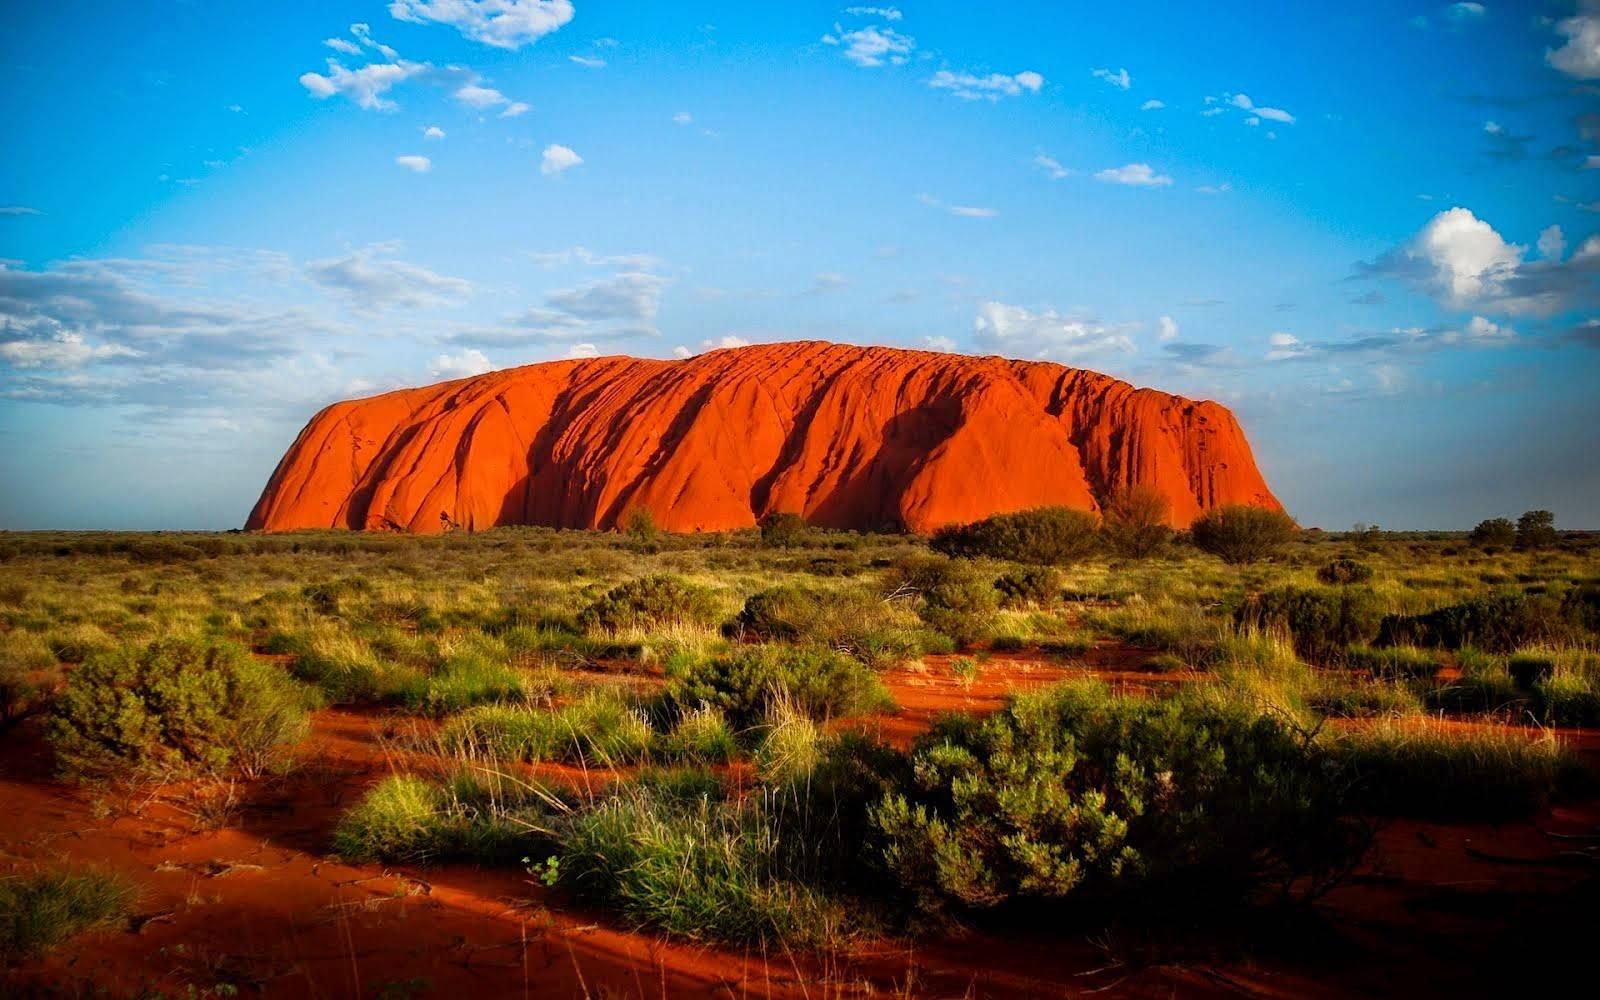 Photo 1: Uluru Kata Tjuta - Au coeur du territoire Aborigène